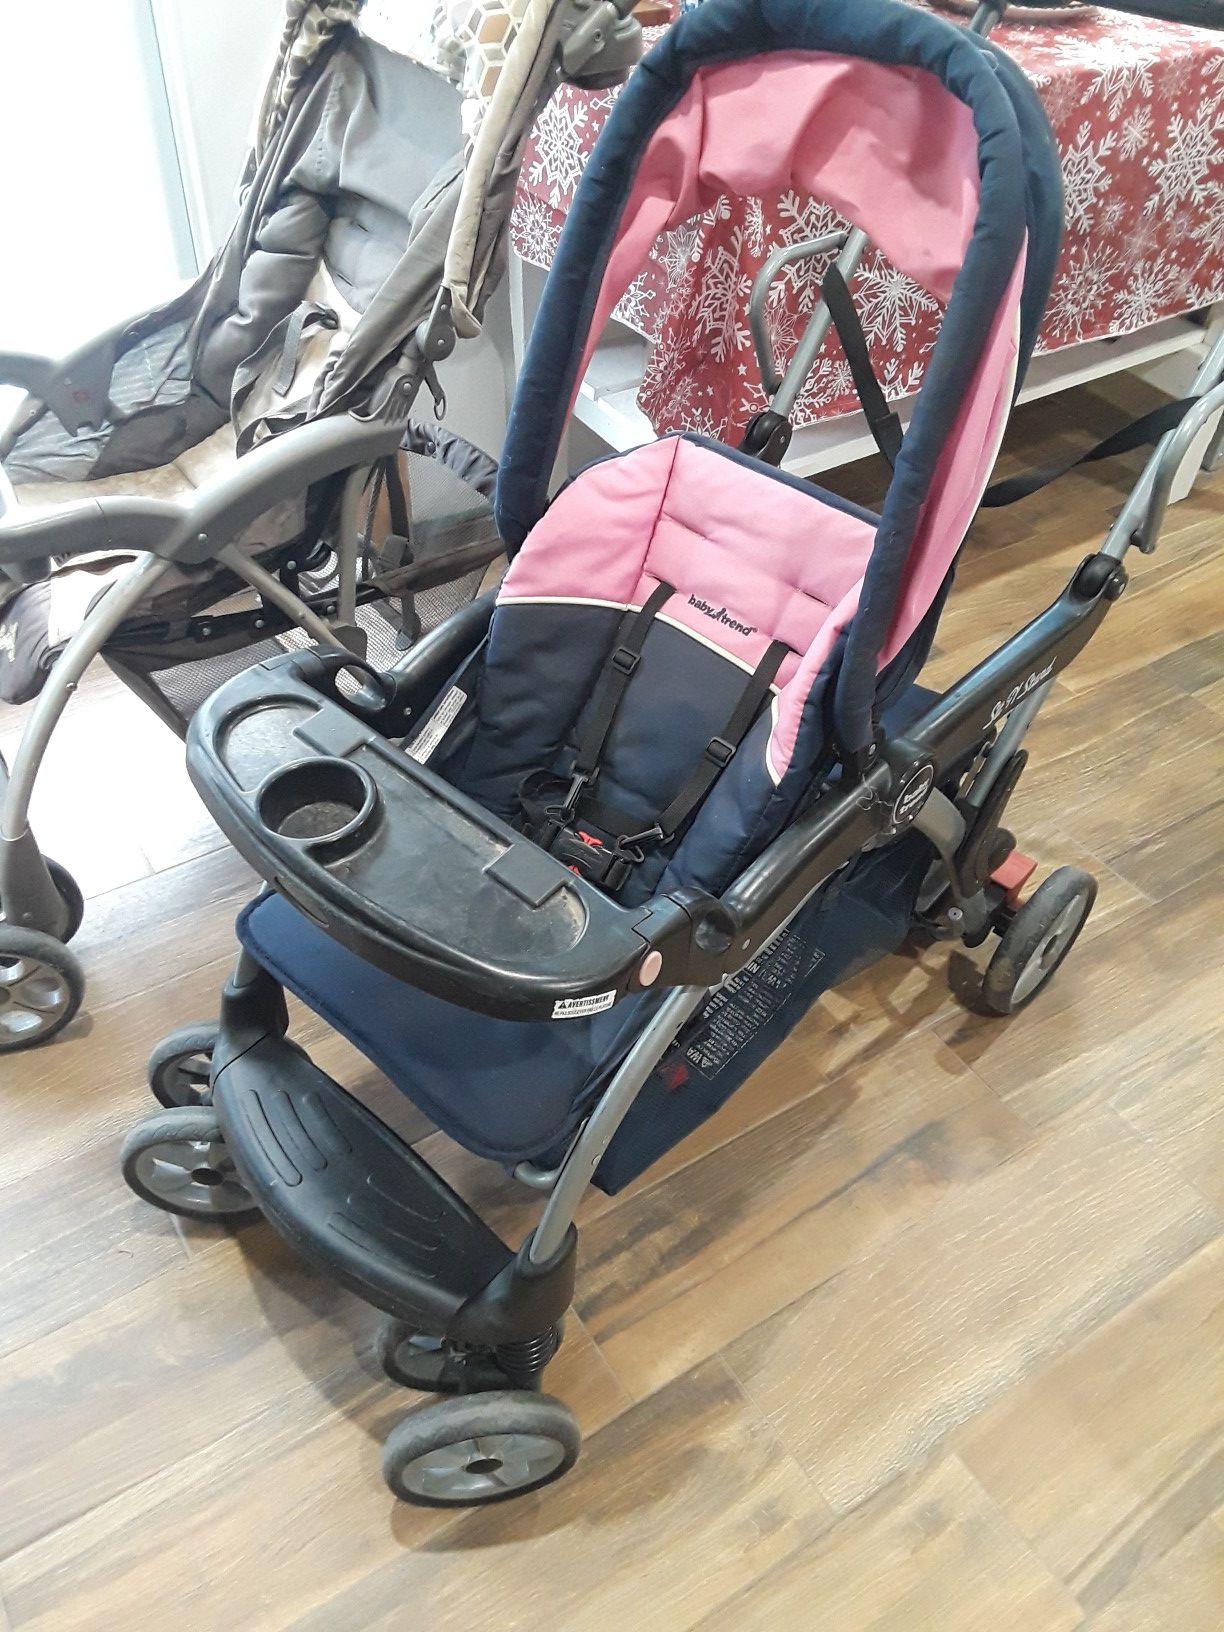 3 strollers